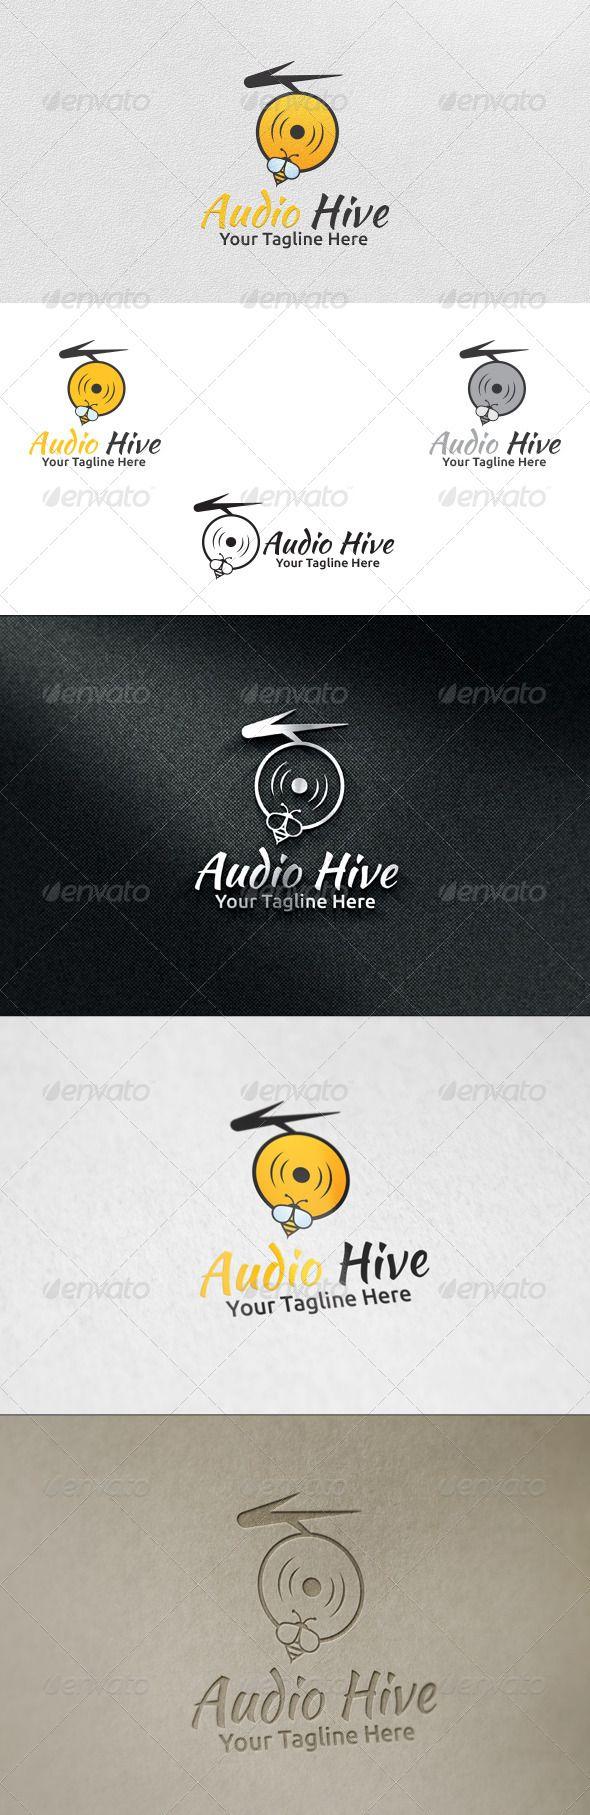 Audio Hive Logo Template — Vector EPS #audio bee #dj bee • Available ...